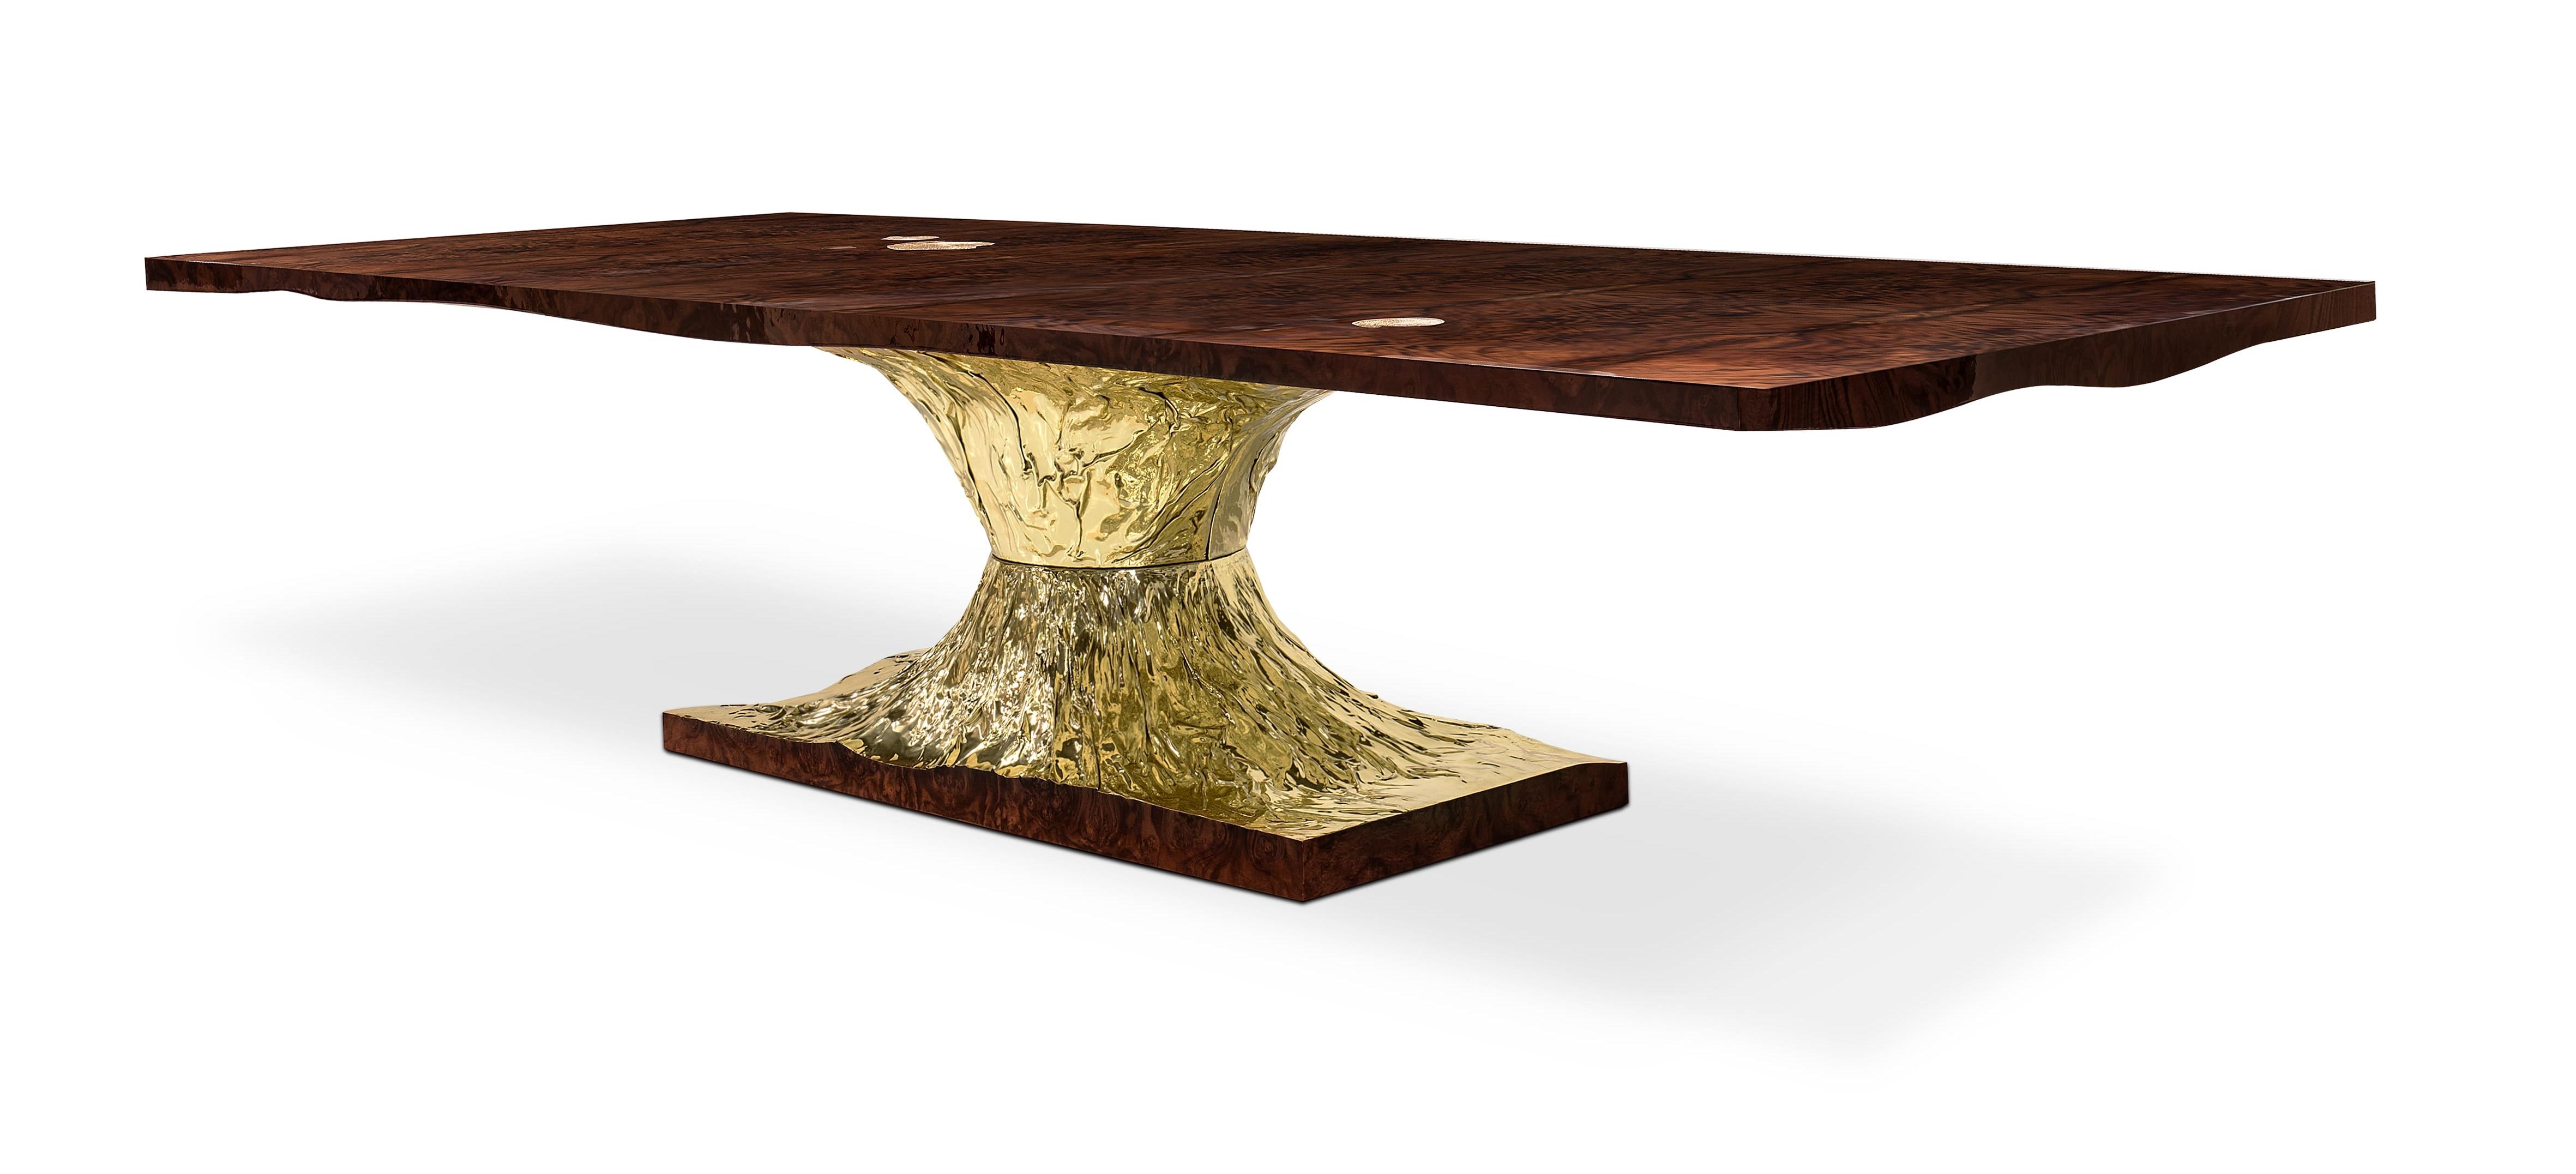 luxury furniture Luxury Furniture: Discover Metamorphosis Series Iconic Pieces metamorphosis dining table 02 hr 1